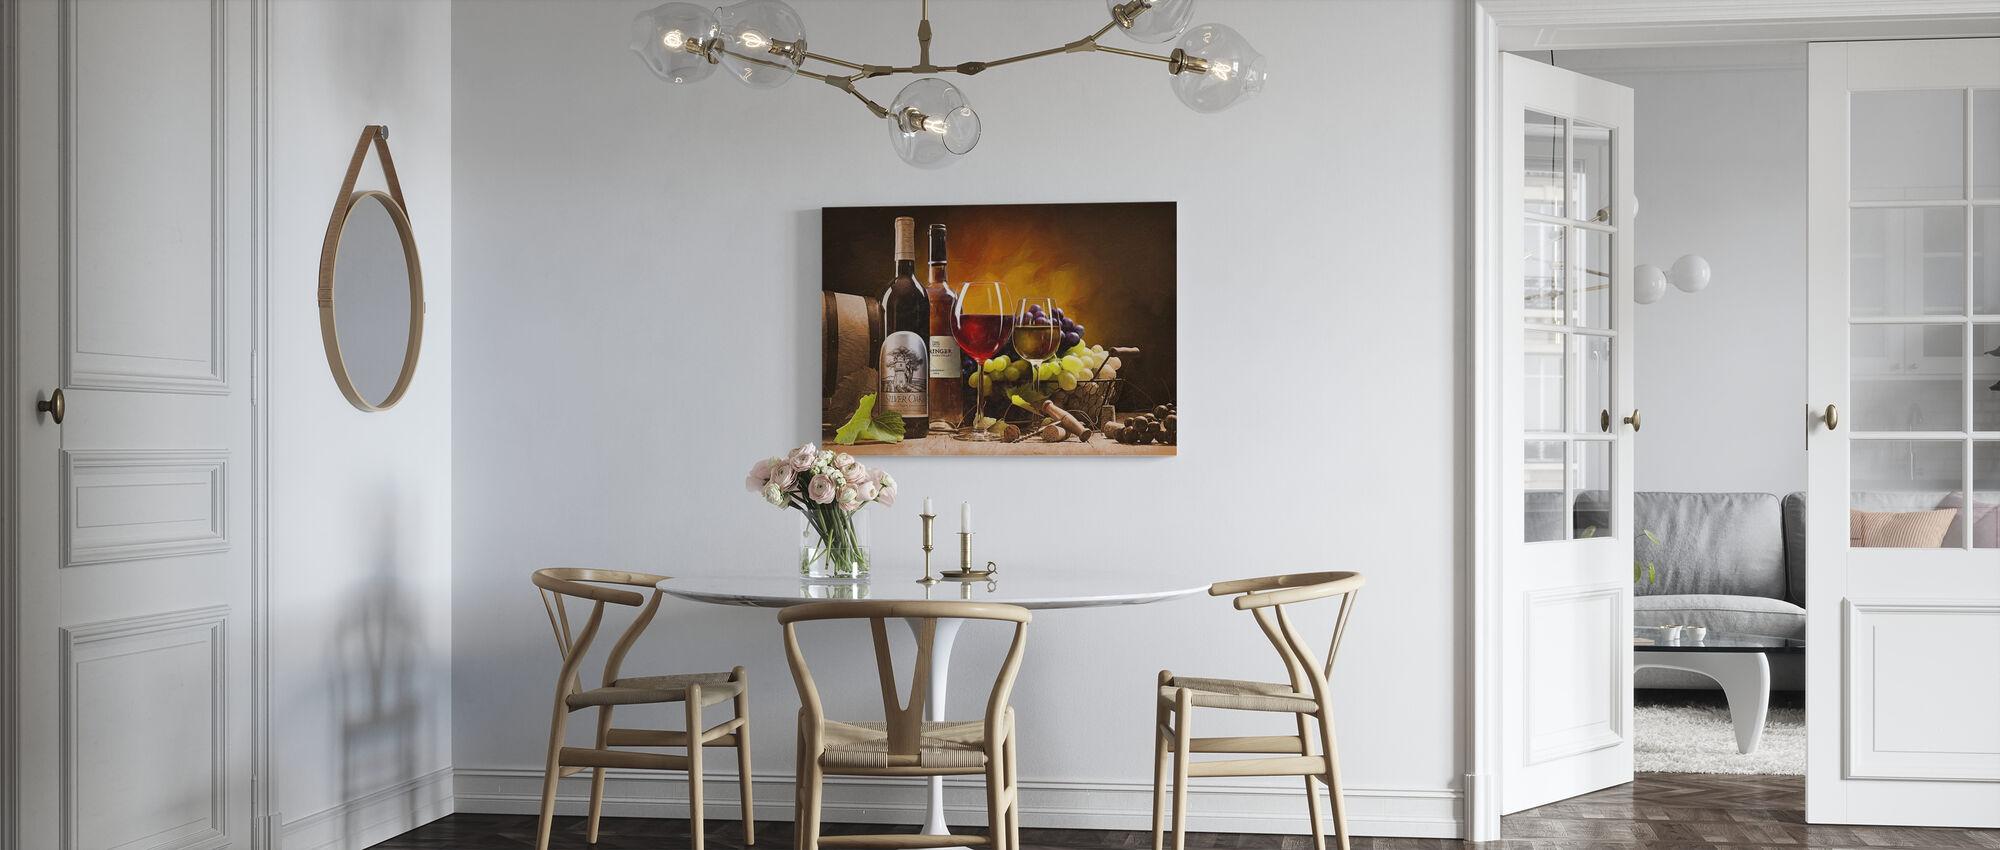 A Taste of Napa Valley - Canvas print - Kitchen